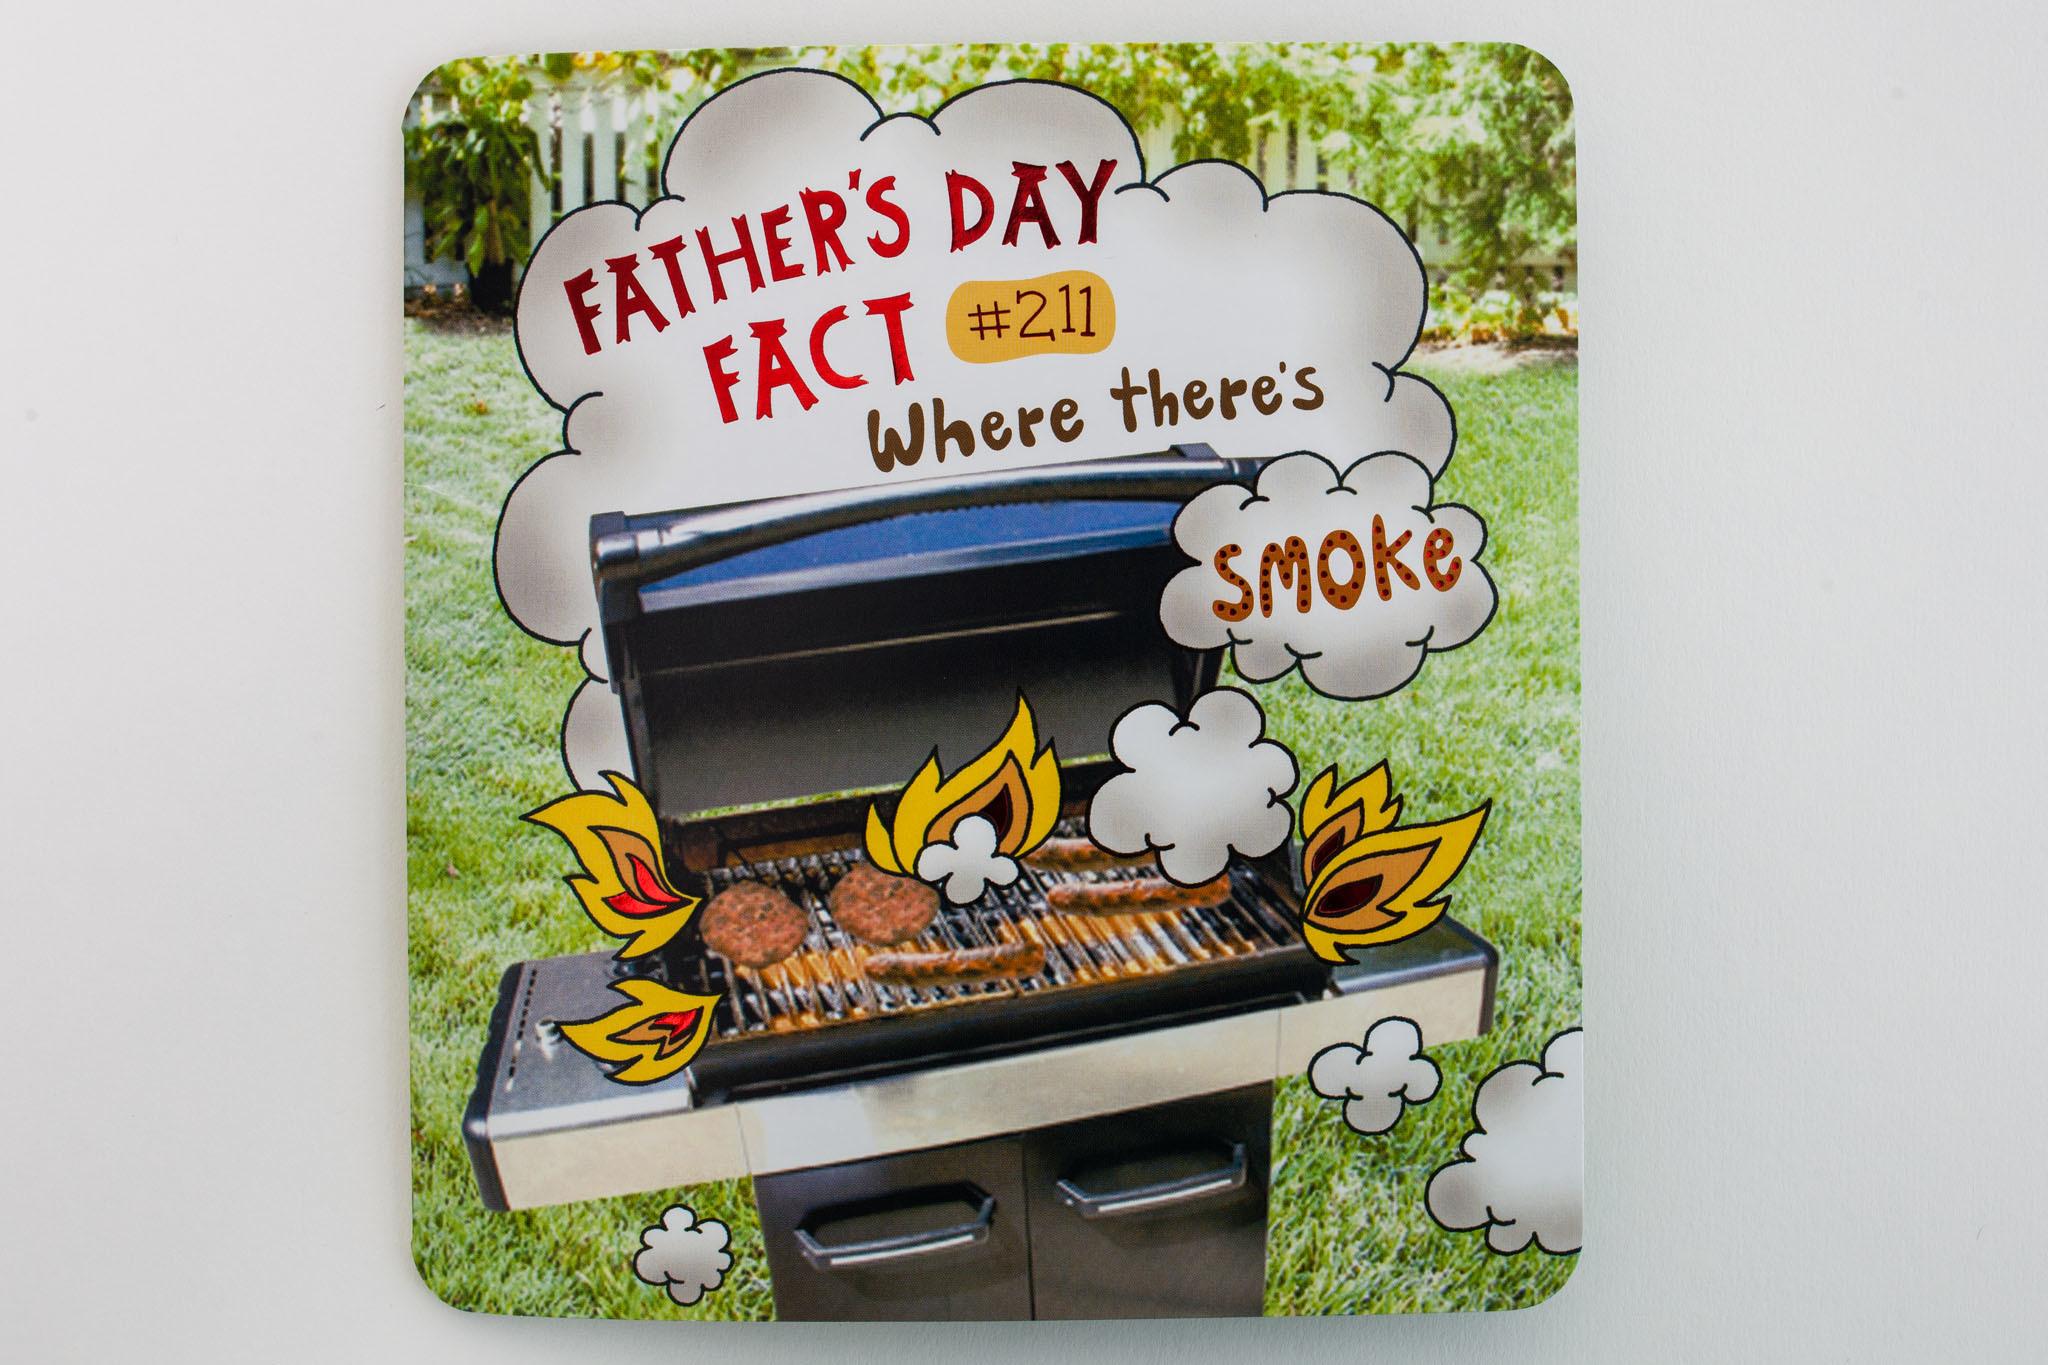 Father's Day card clichés